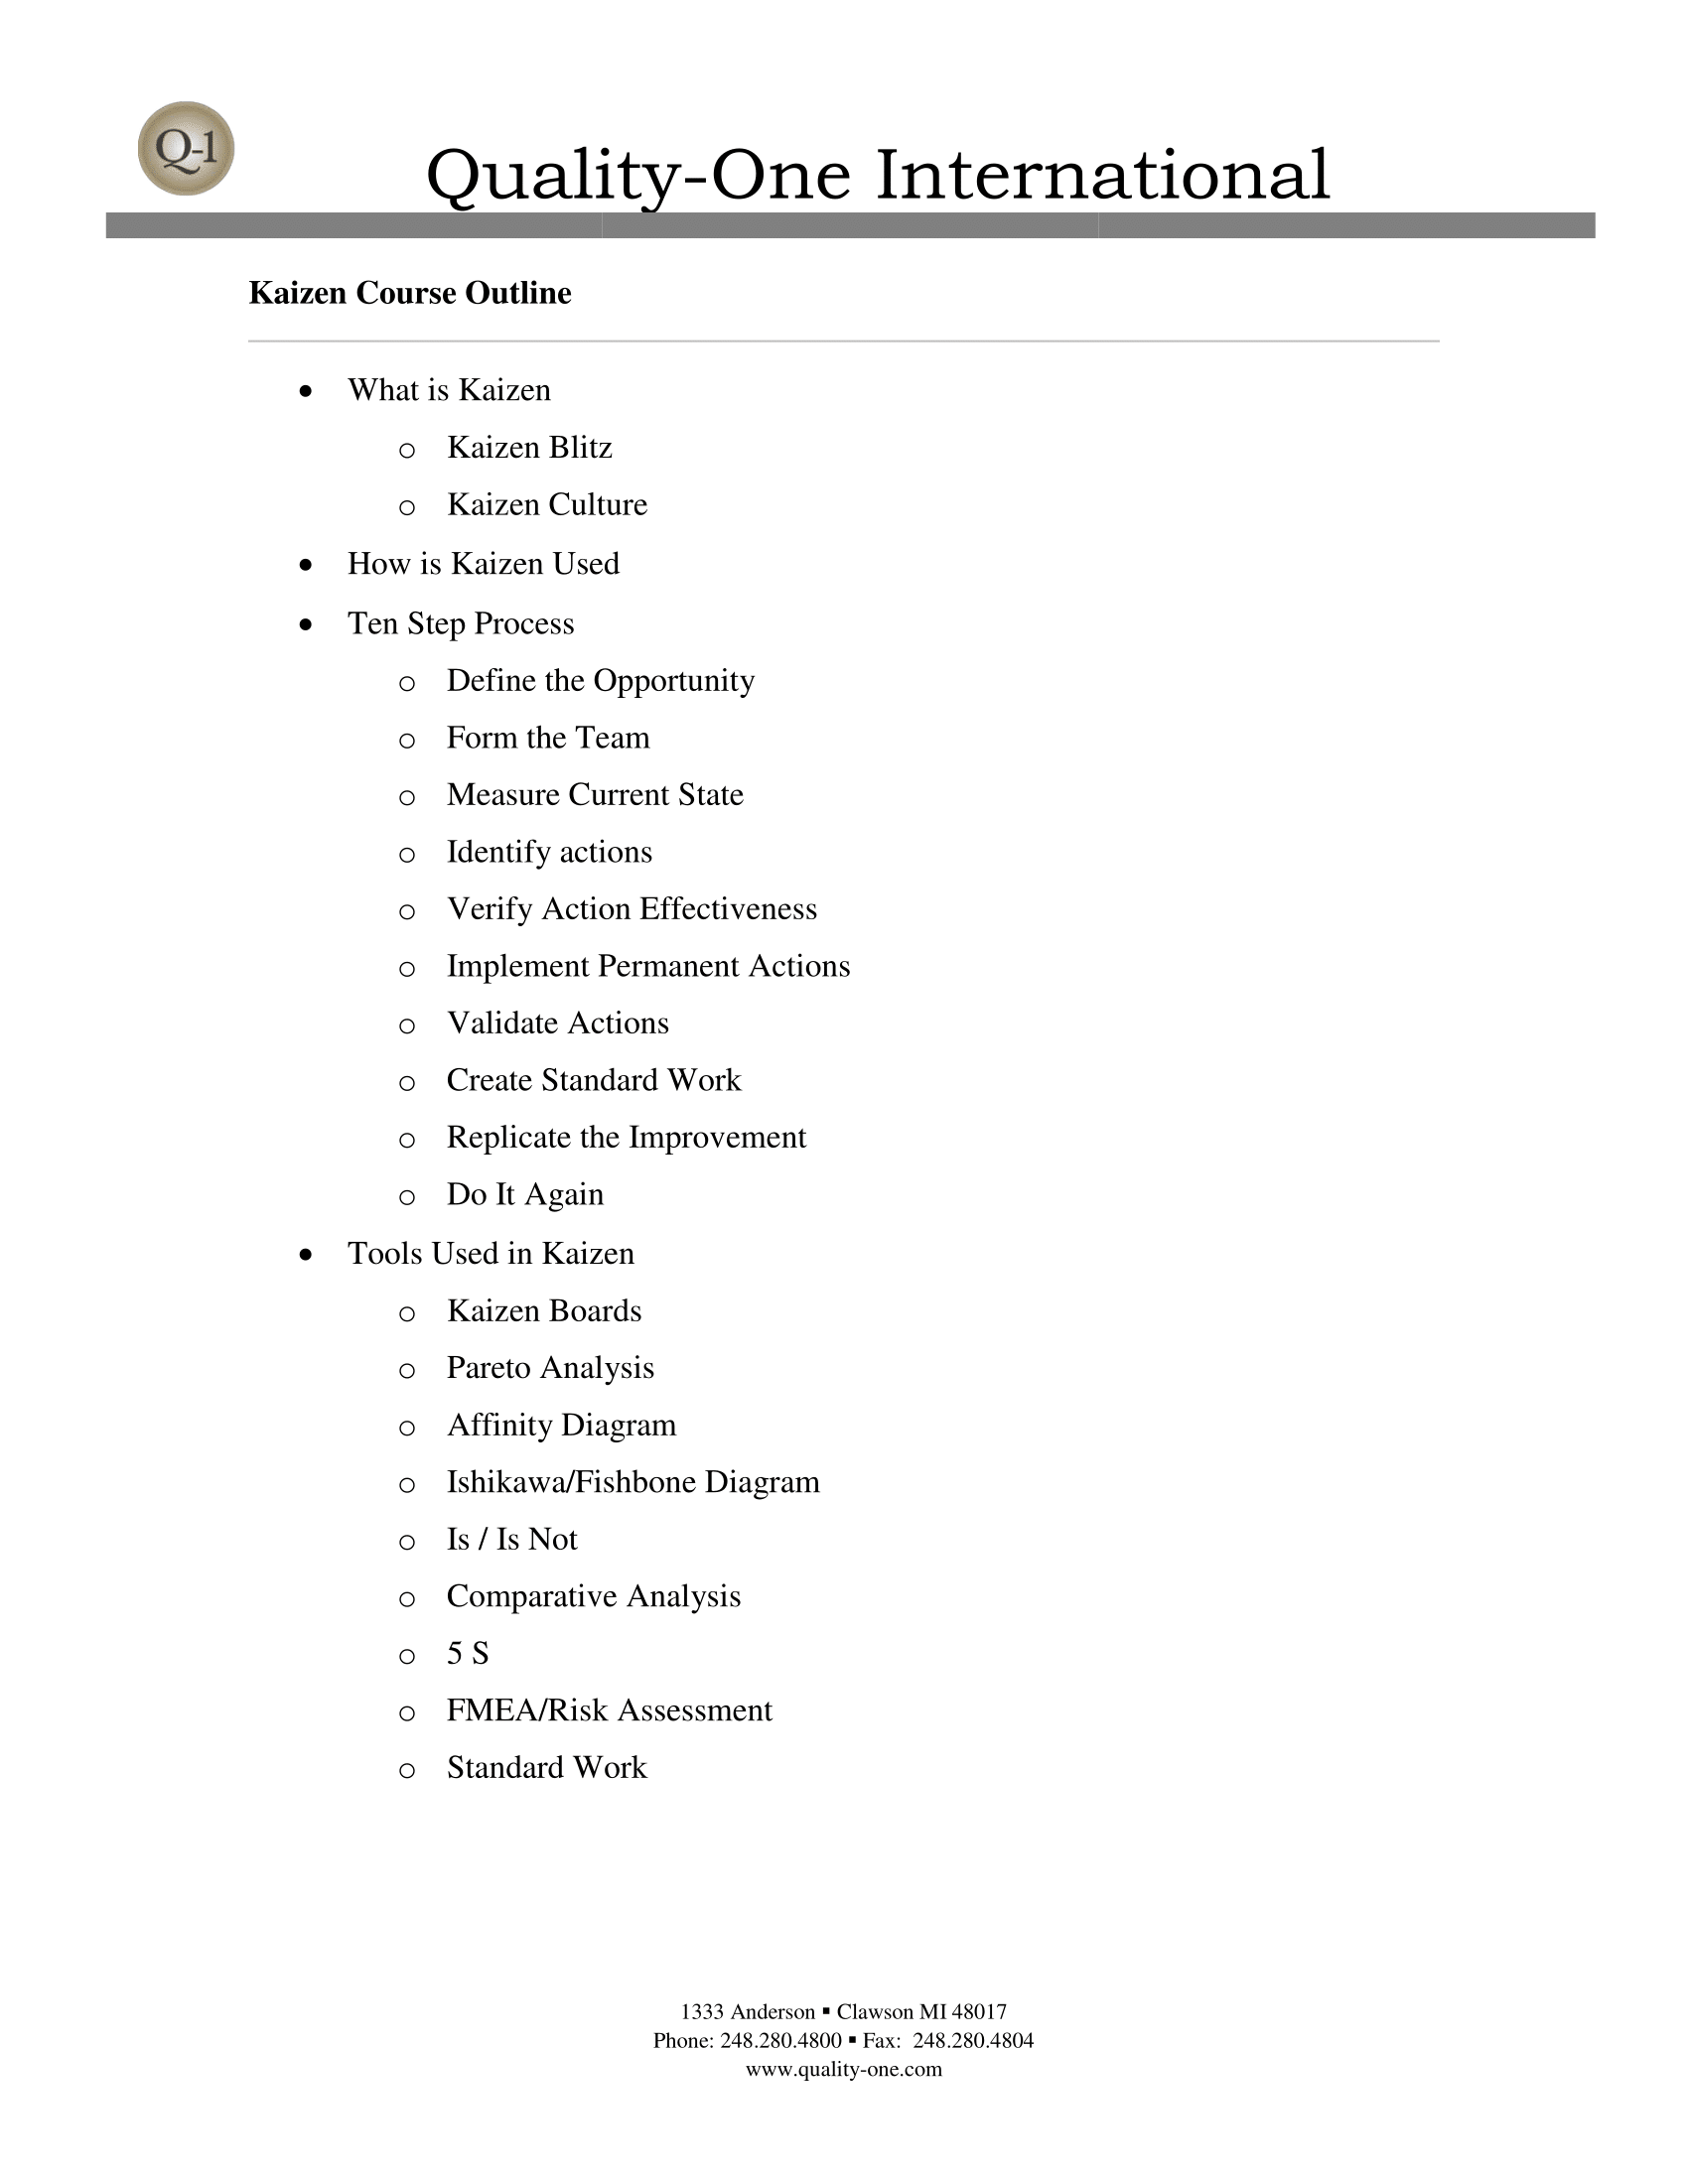 Kaizen Training Course Outline